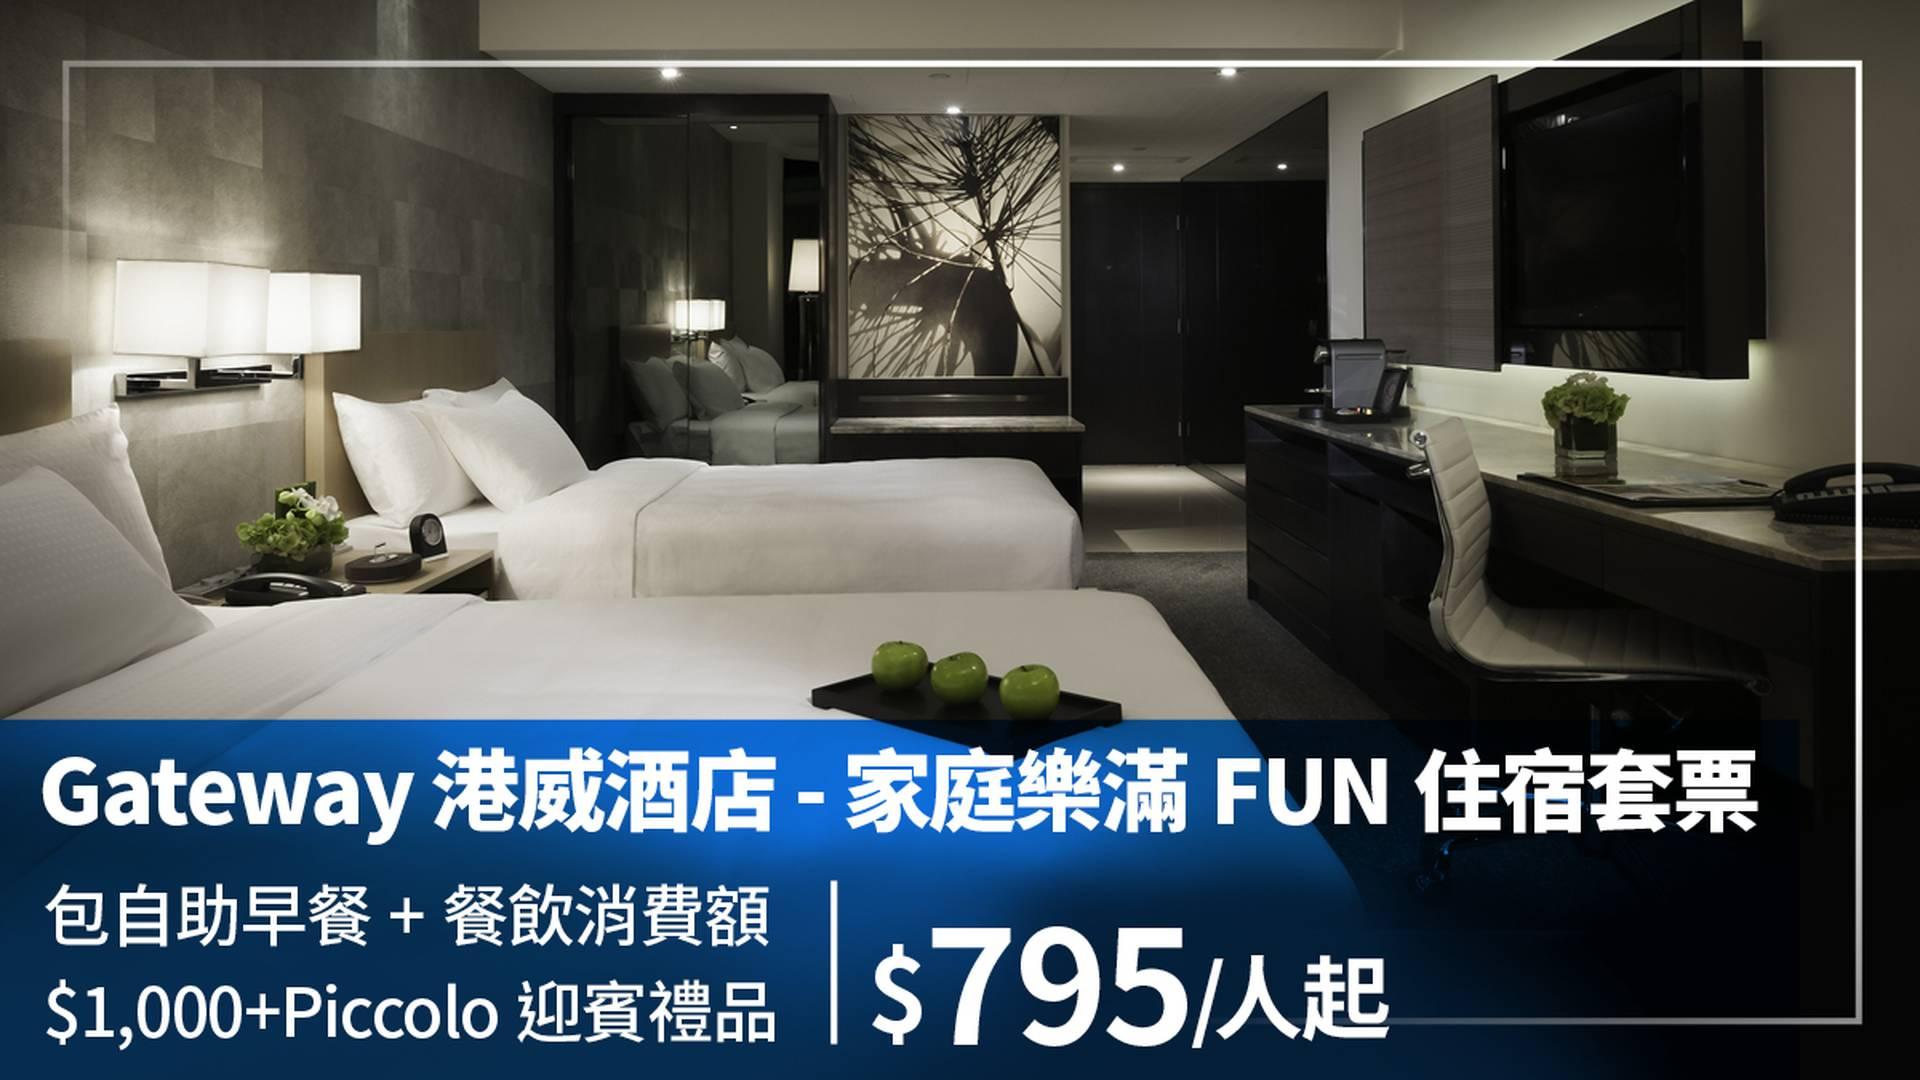 Gateway 港威酒店 - 「家庭樂滿FUN」住宿套票